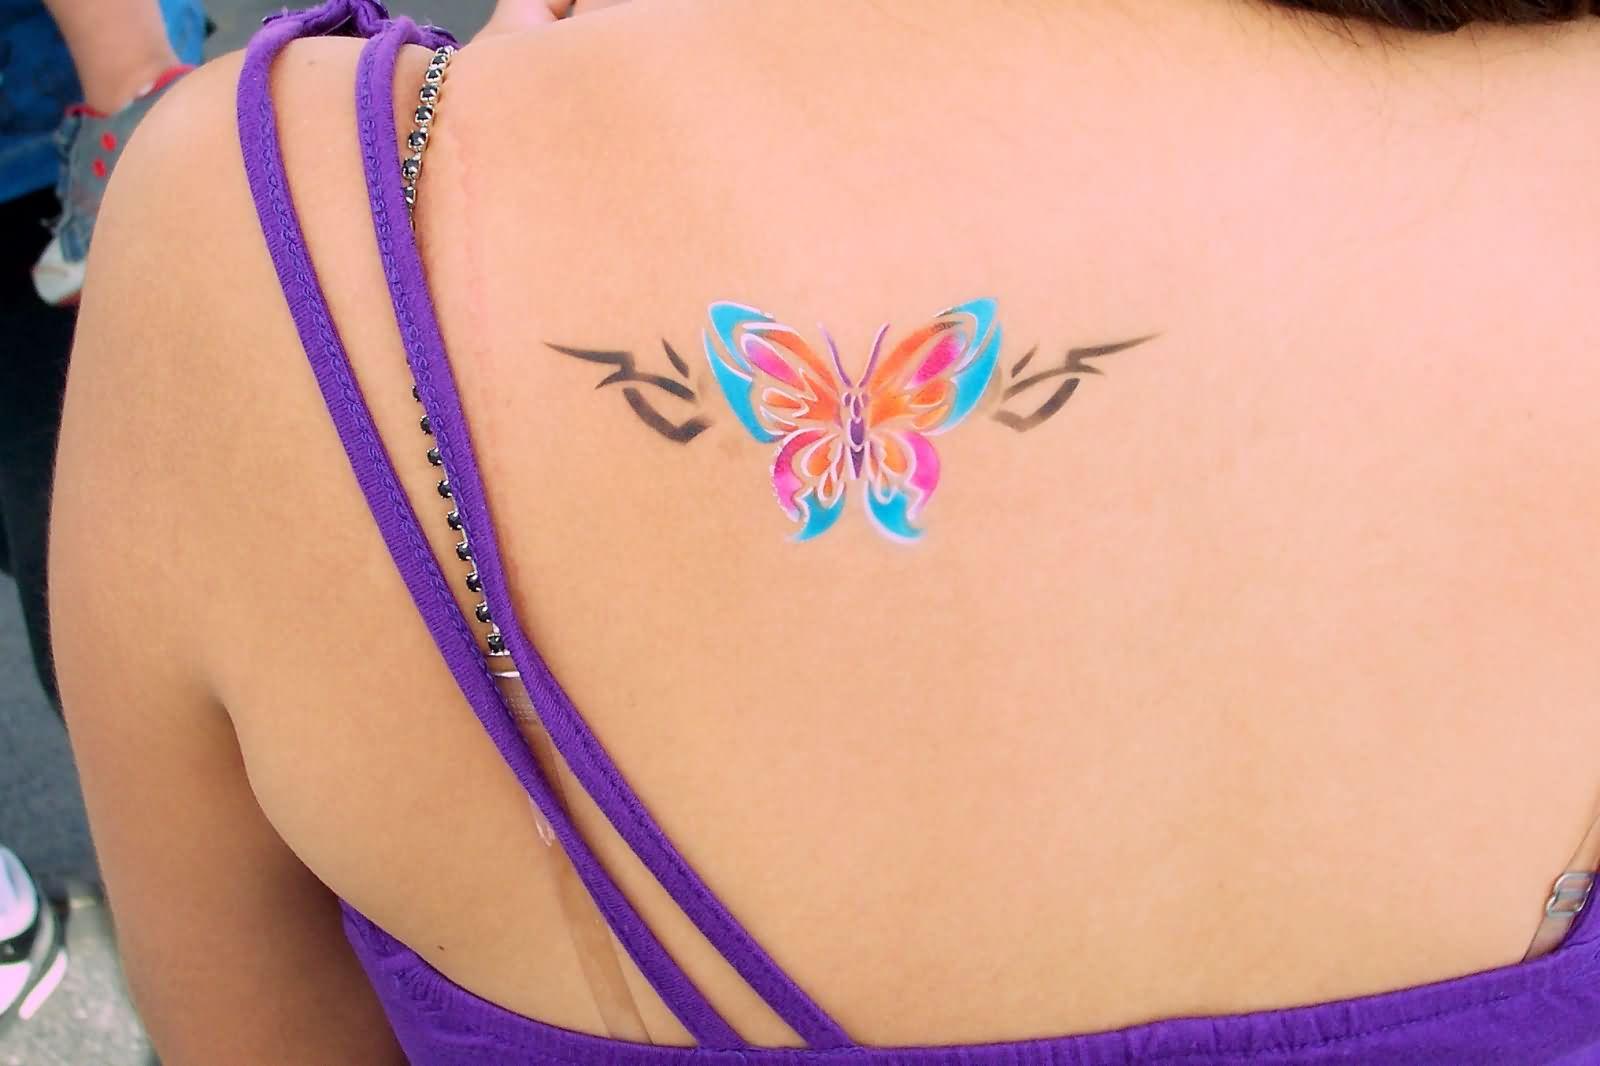 40+ Best Airbrush Tattoos Design